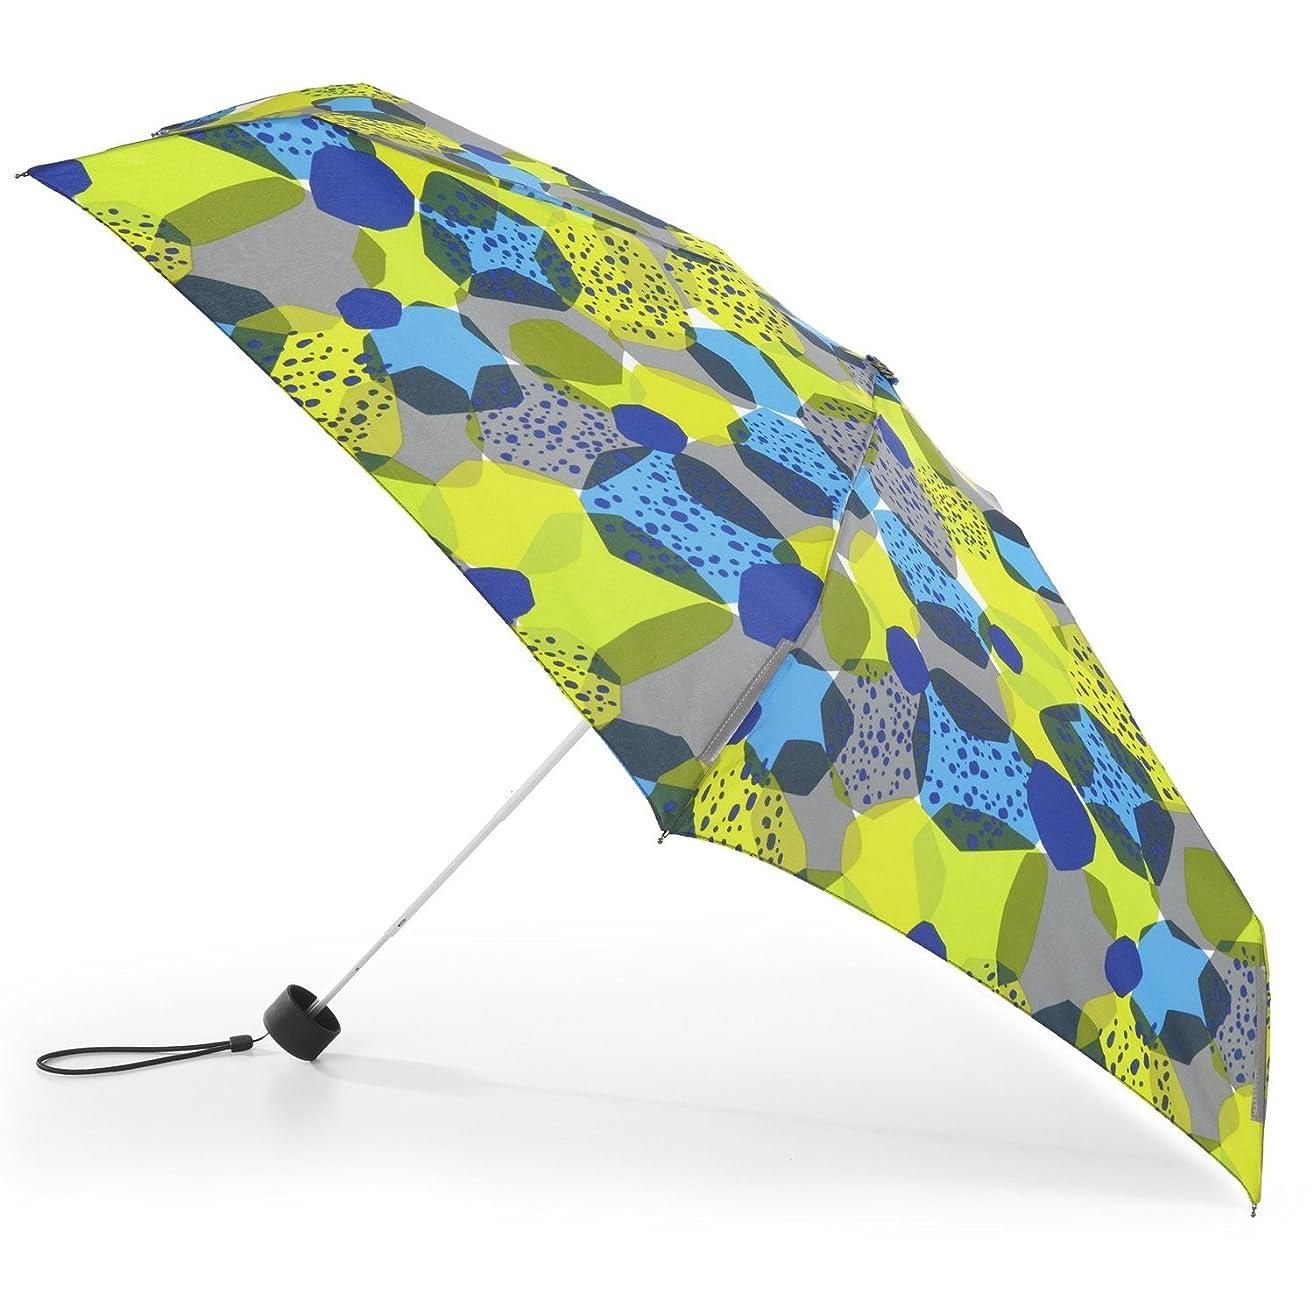 Totes TRX Manual Mini Trekker Umbrella (One size, Outdoor Stones)